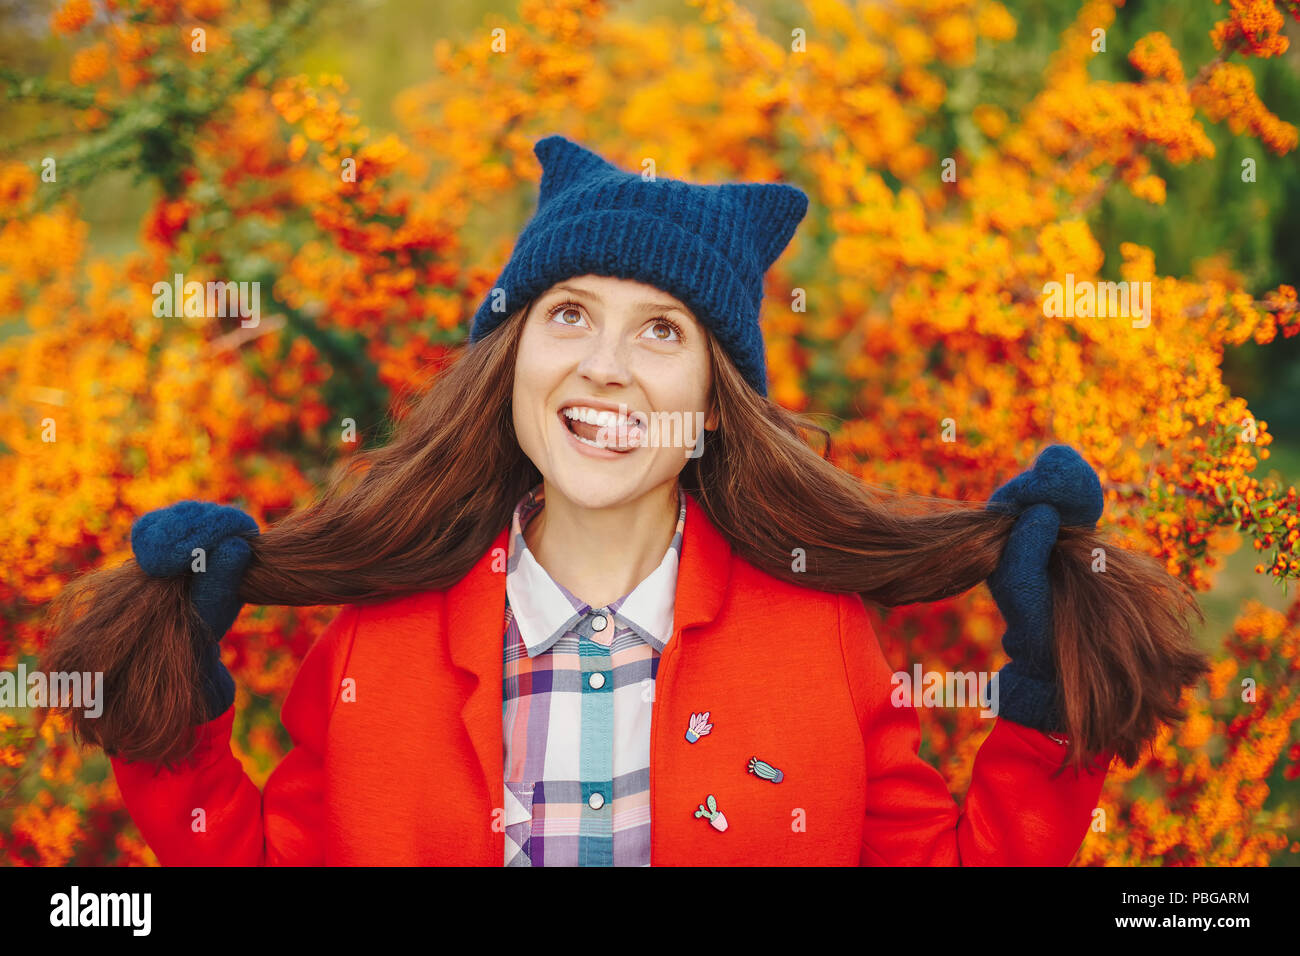 b4c3a17dfa8 Orange Beanie Hat Stock Photos   Orange Beanie Hat Stock Images - Alamy